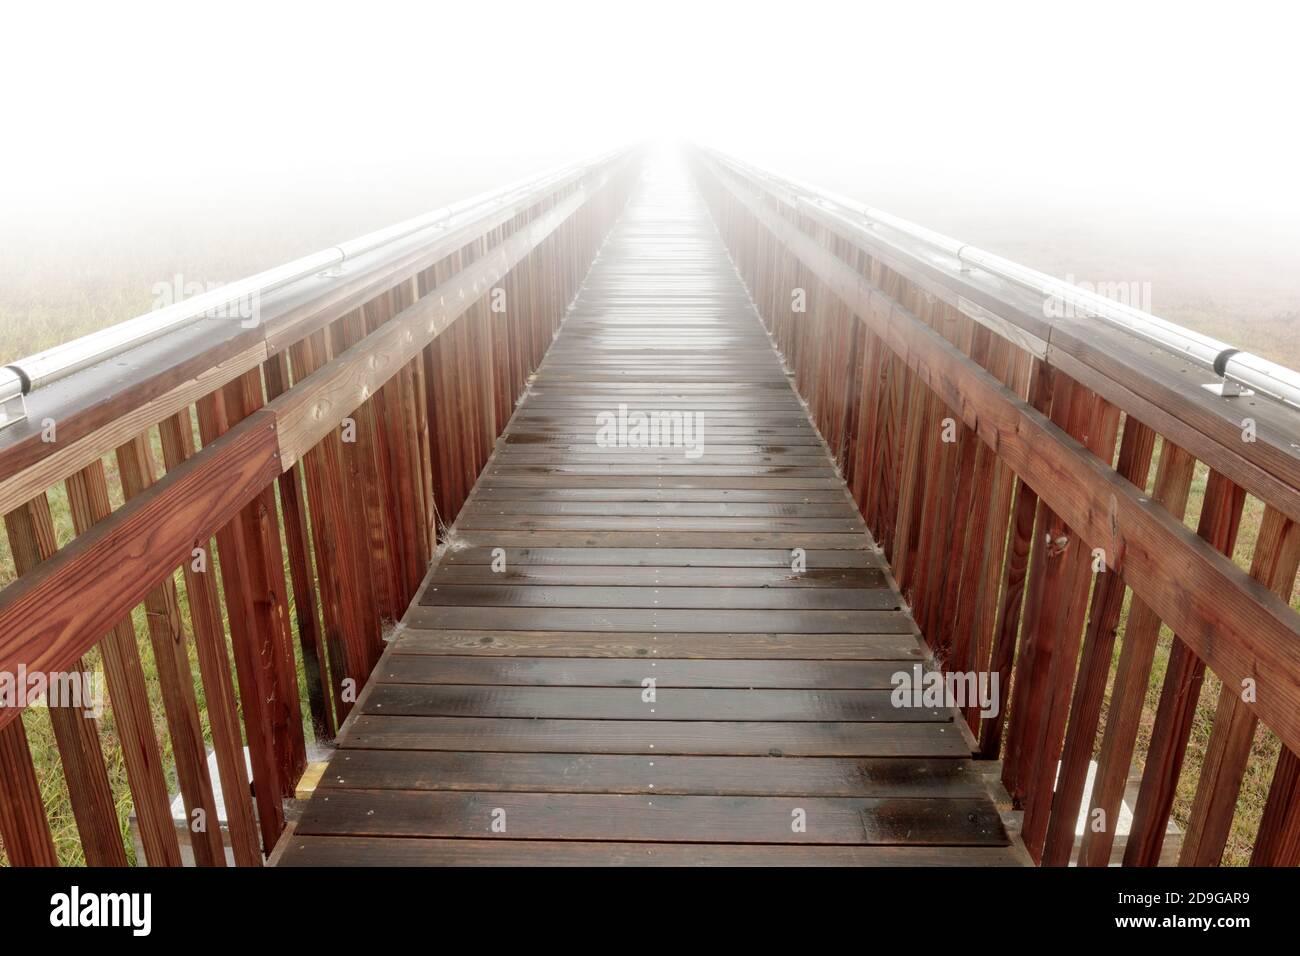 Paseo marítimo en espesa mañana niebla Foto de stock